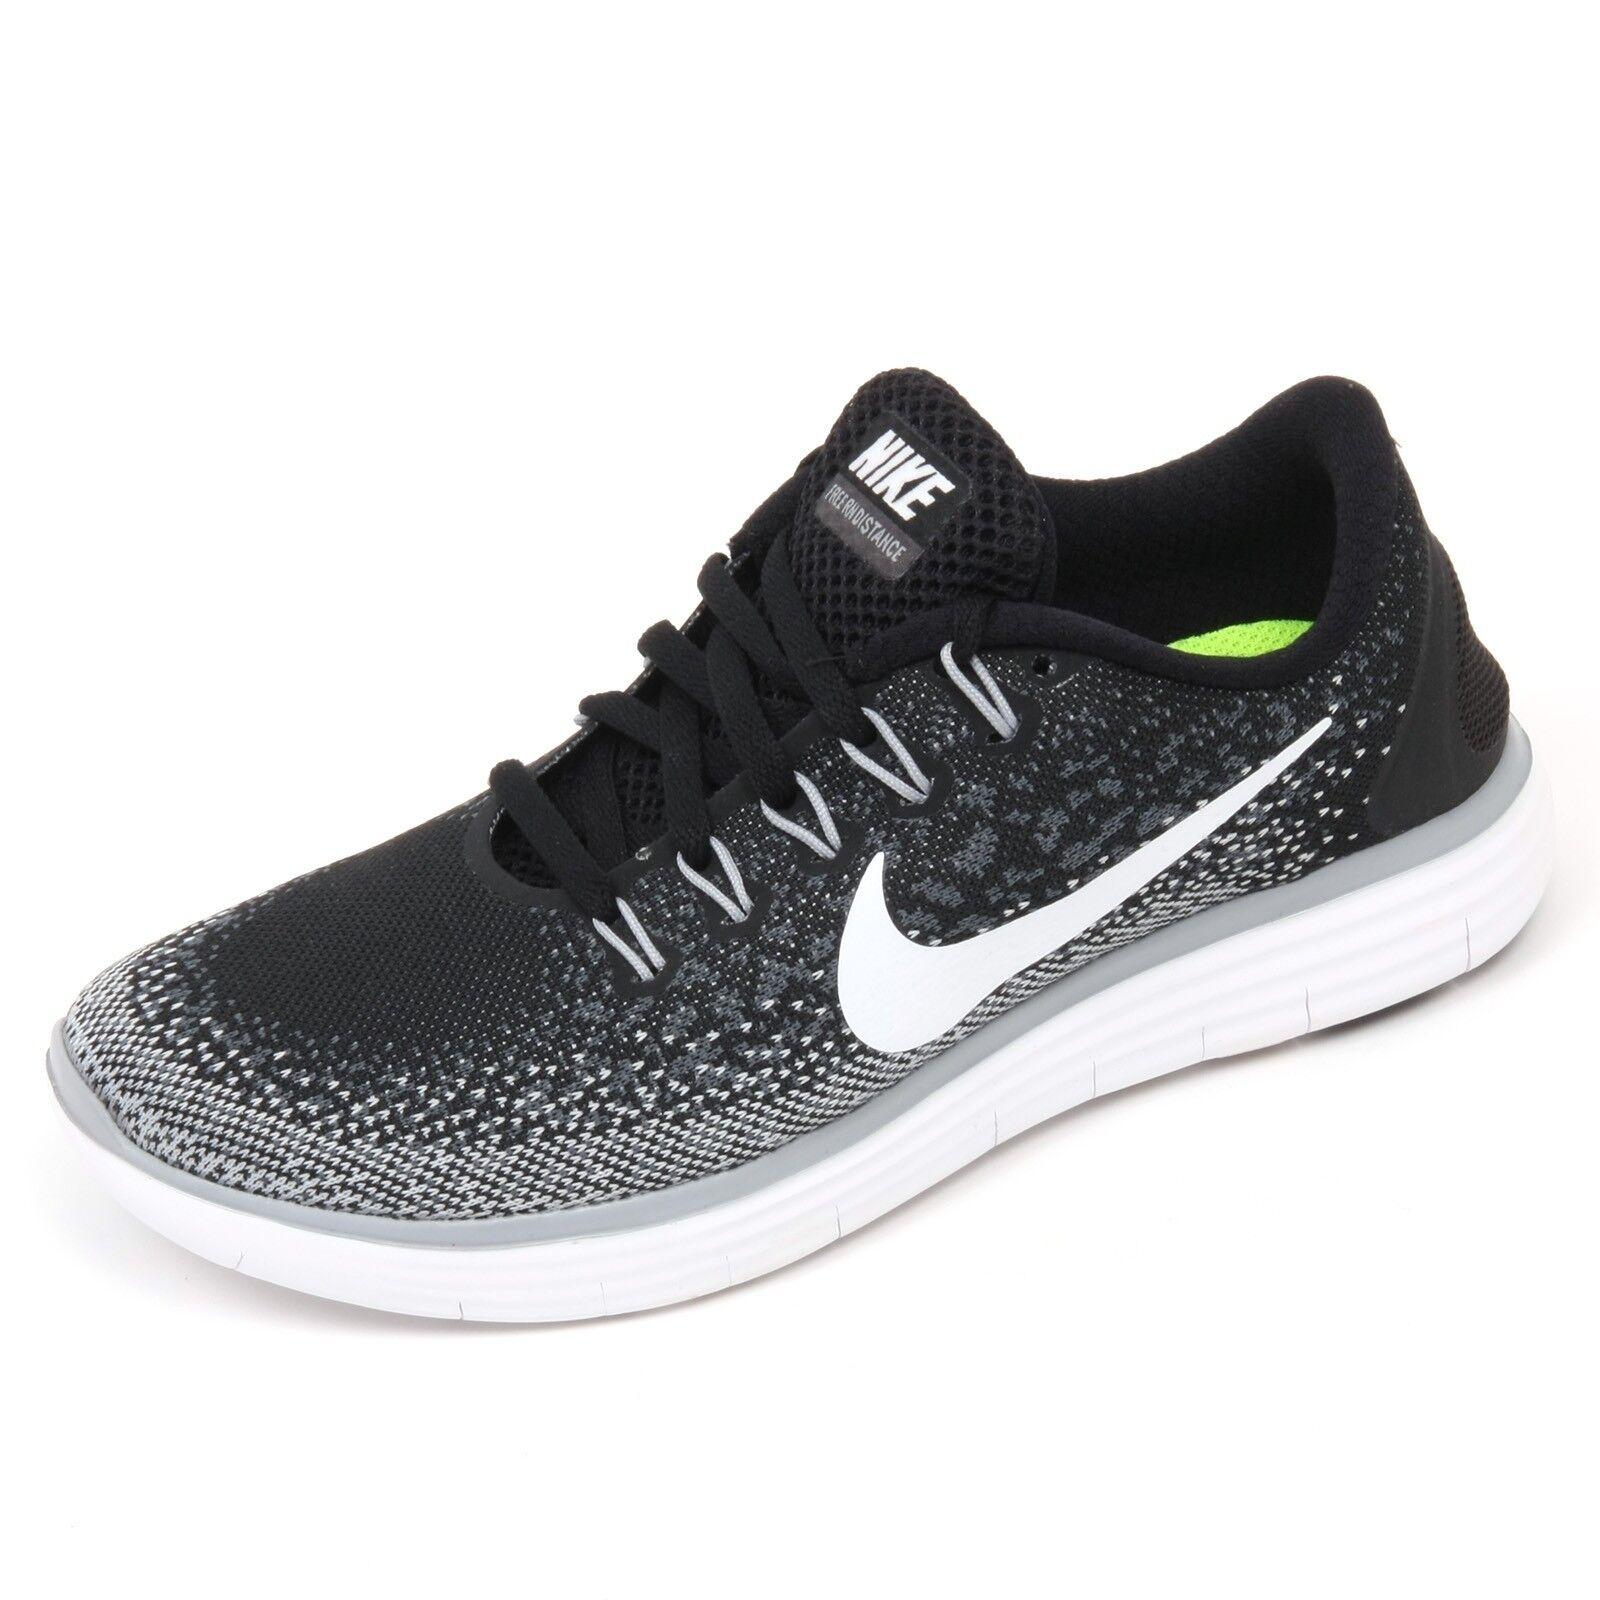 C5912 sneaker donna NIKE FREE RN DISTBNCE bianco/nero/grigio shoe woman